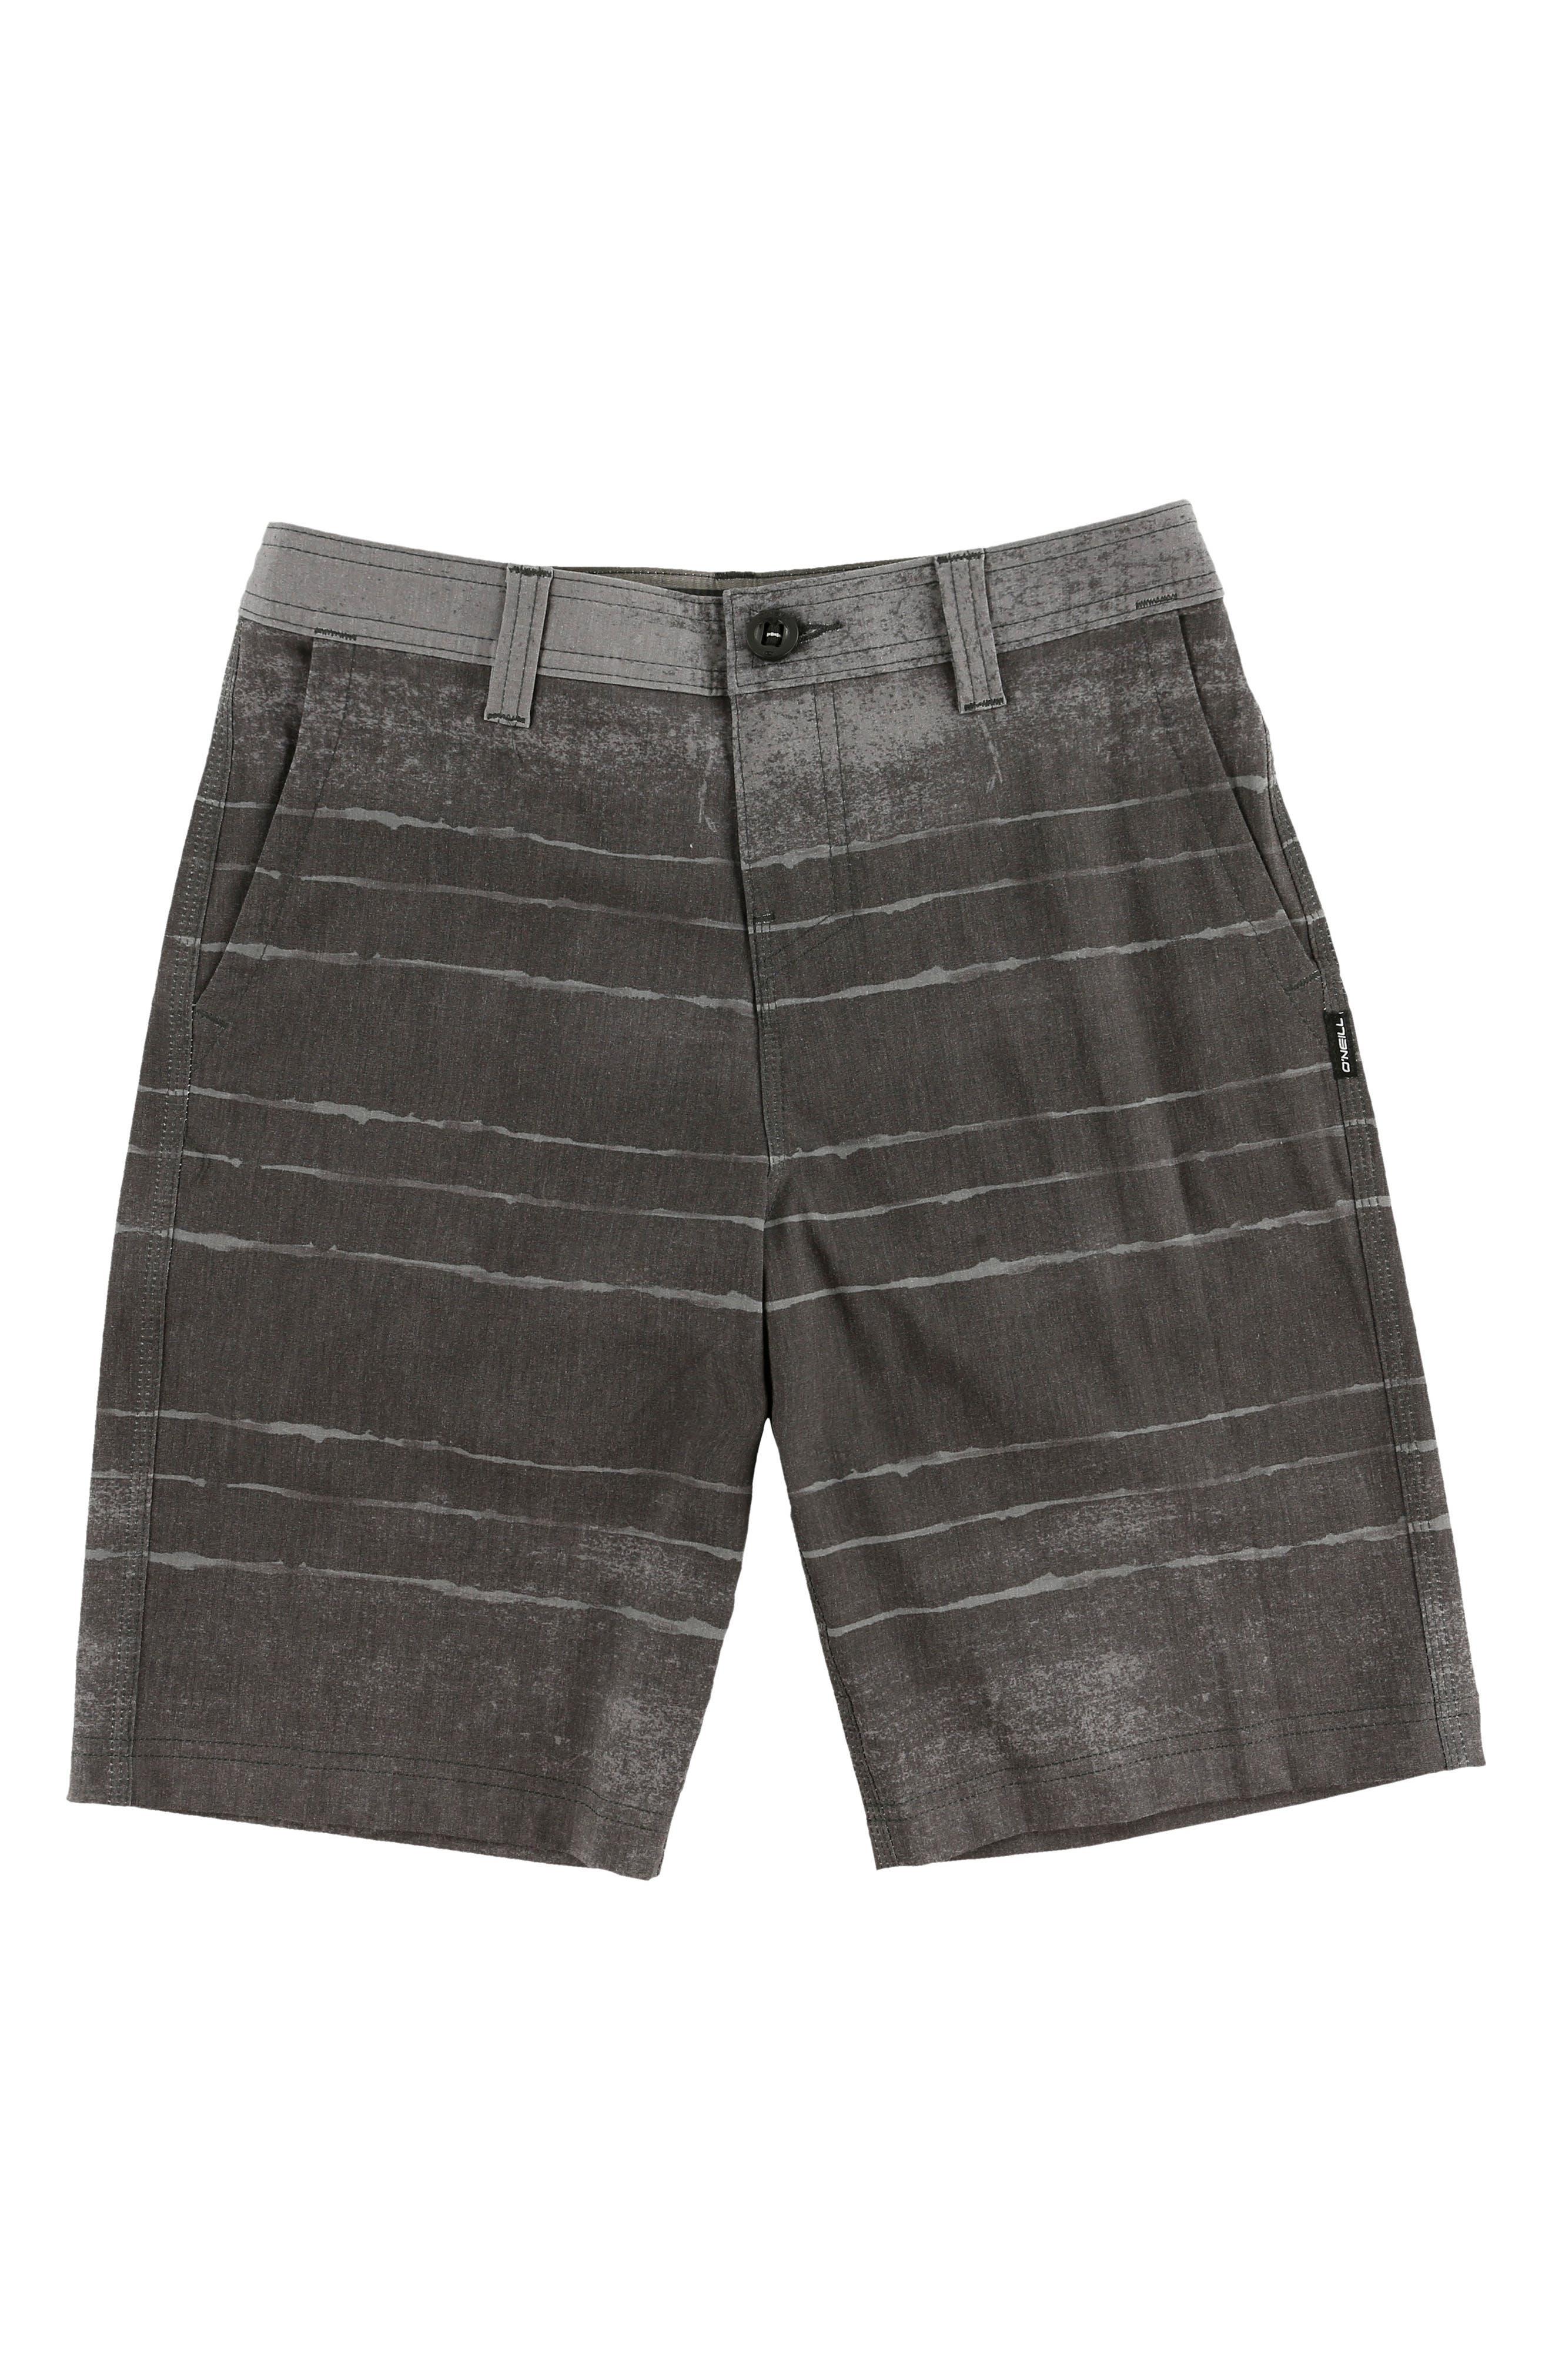 O'NEILL Tye Striper Hybrid Shorts, Main, color, ASPHALT